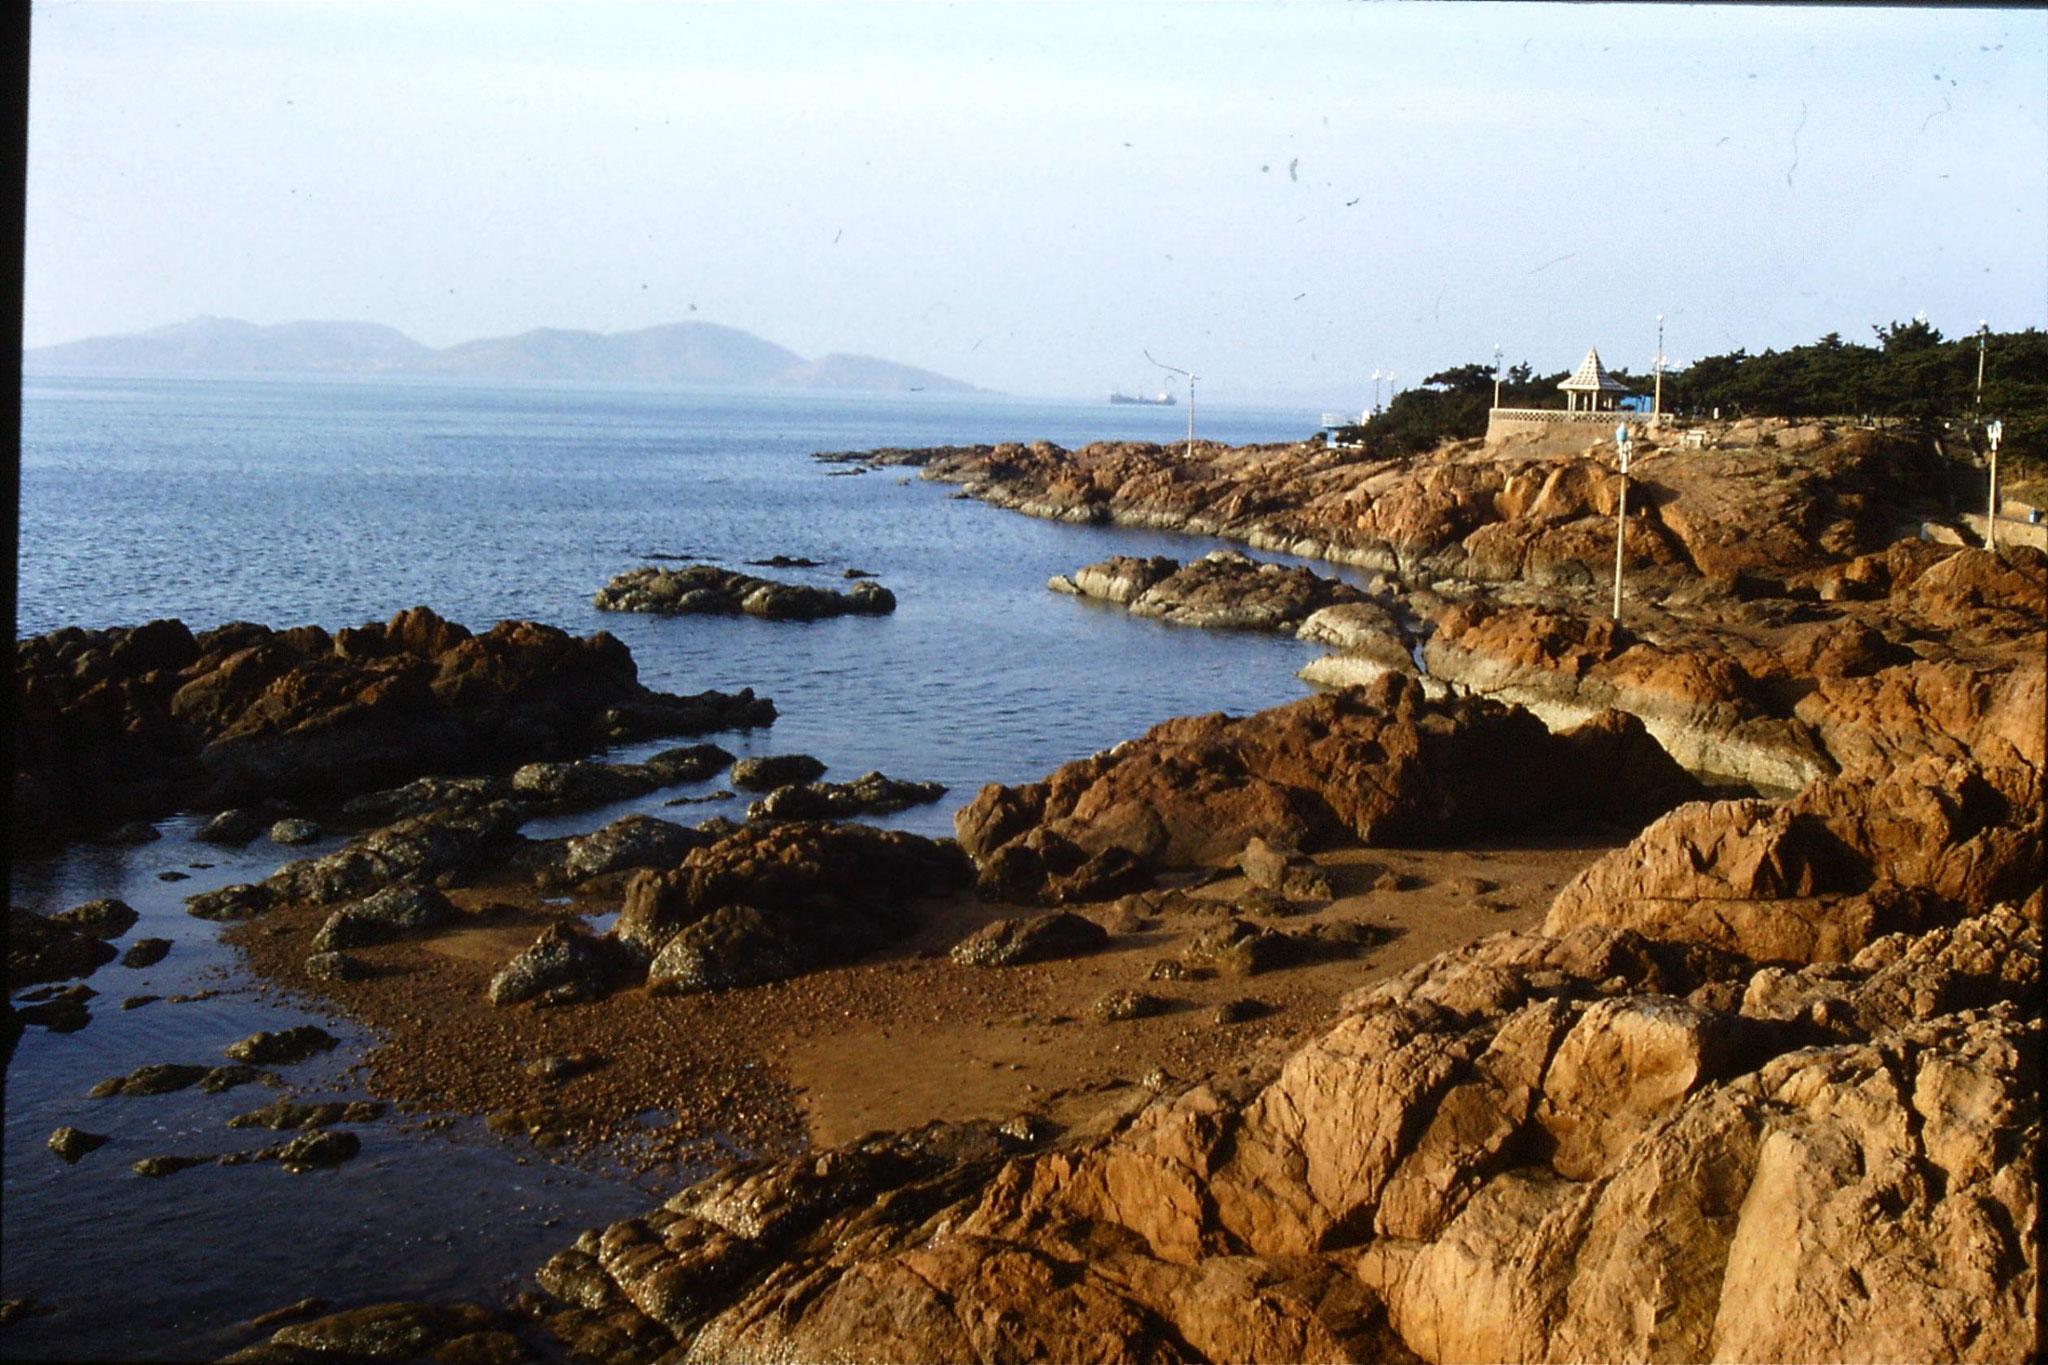 14/2/1989: 0: Qingdao beach